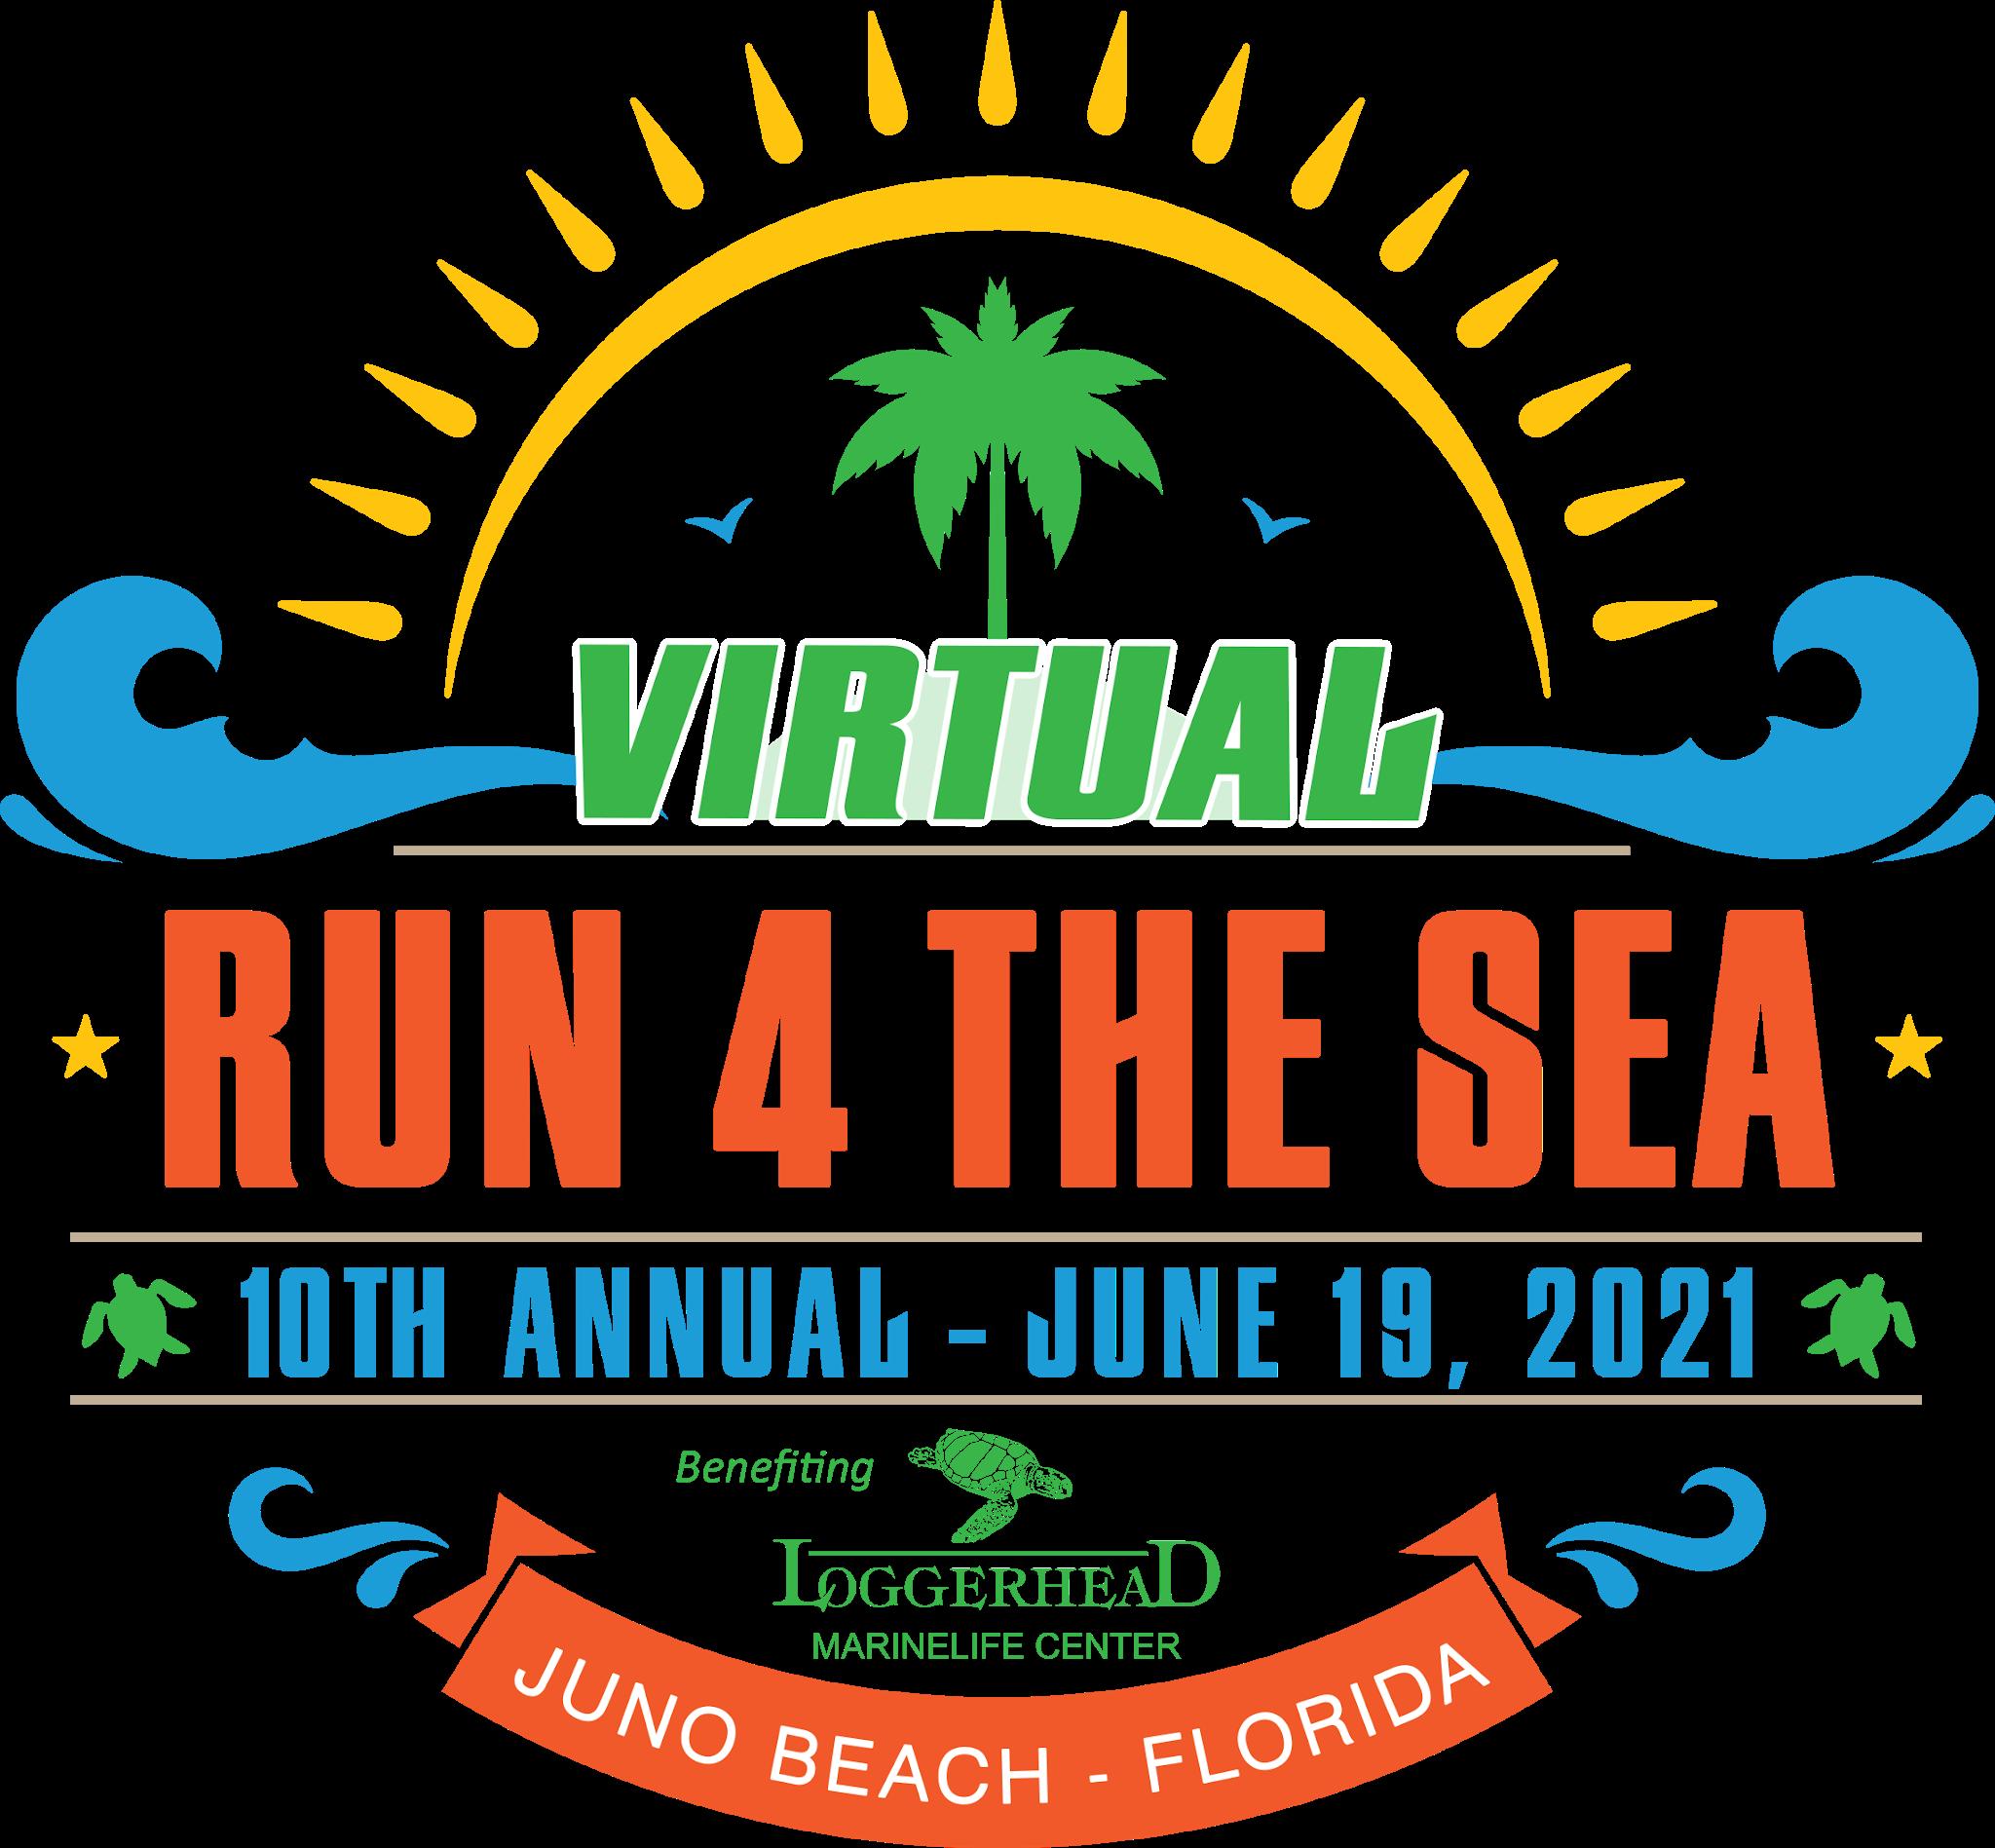 2021_Virtual_Run4TheSea_logo